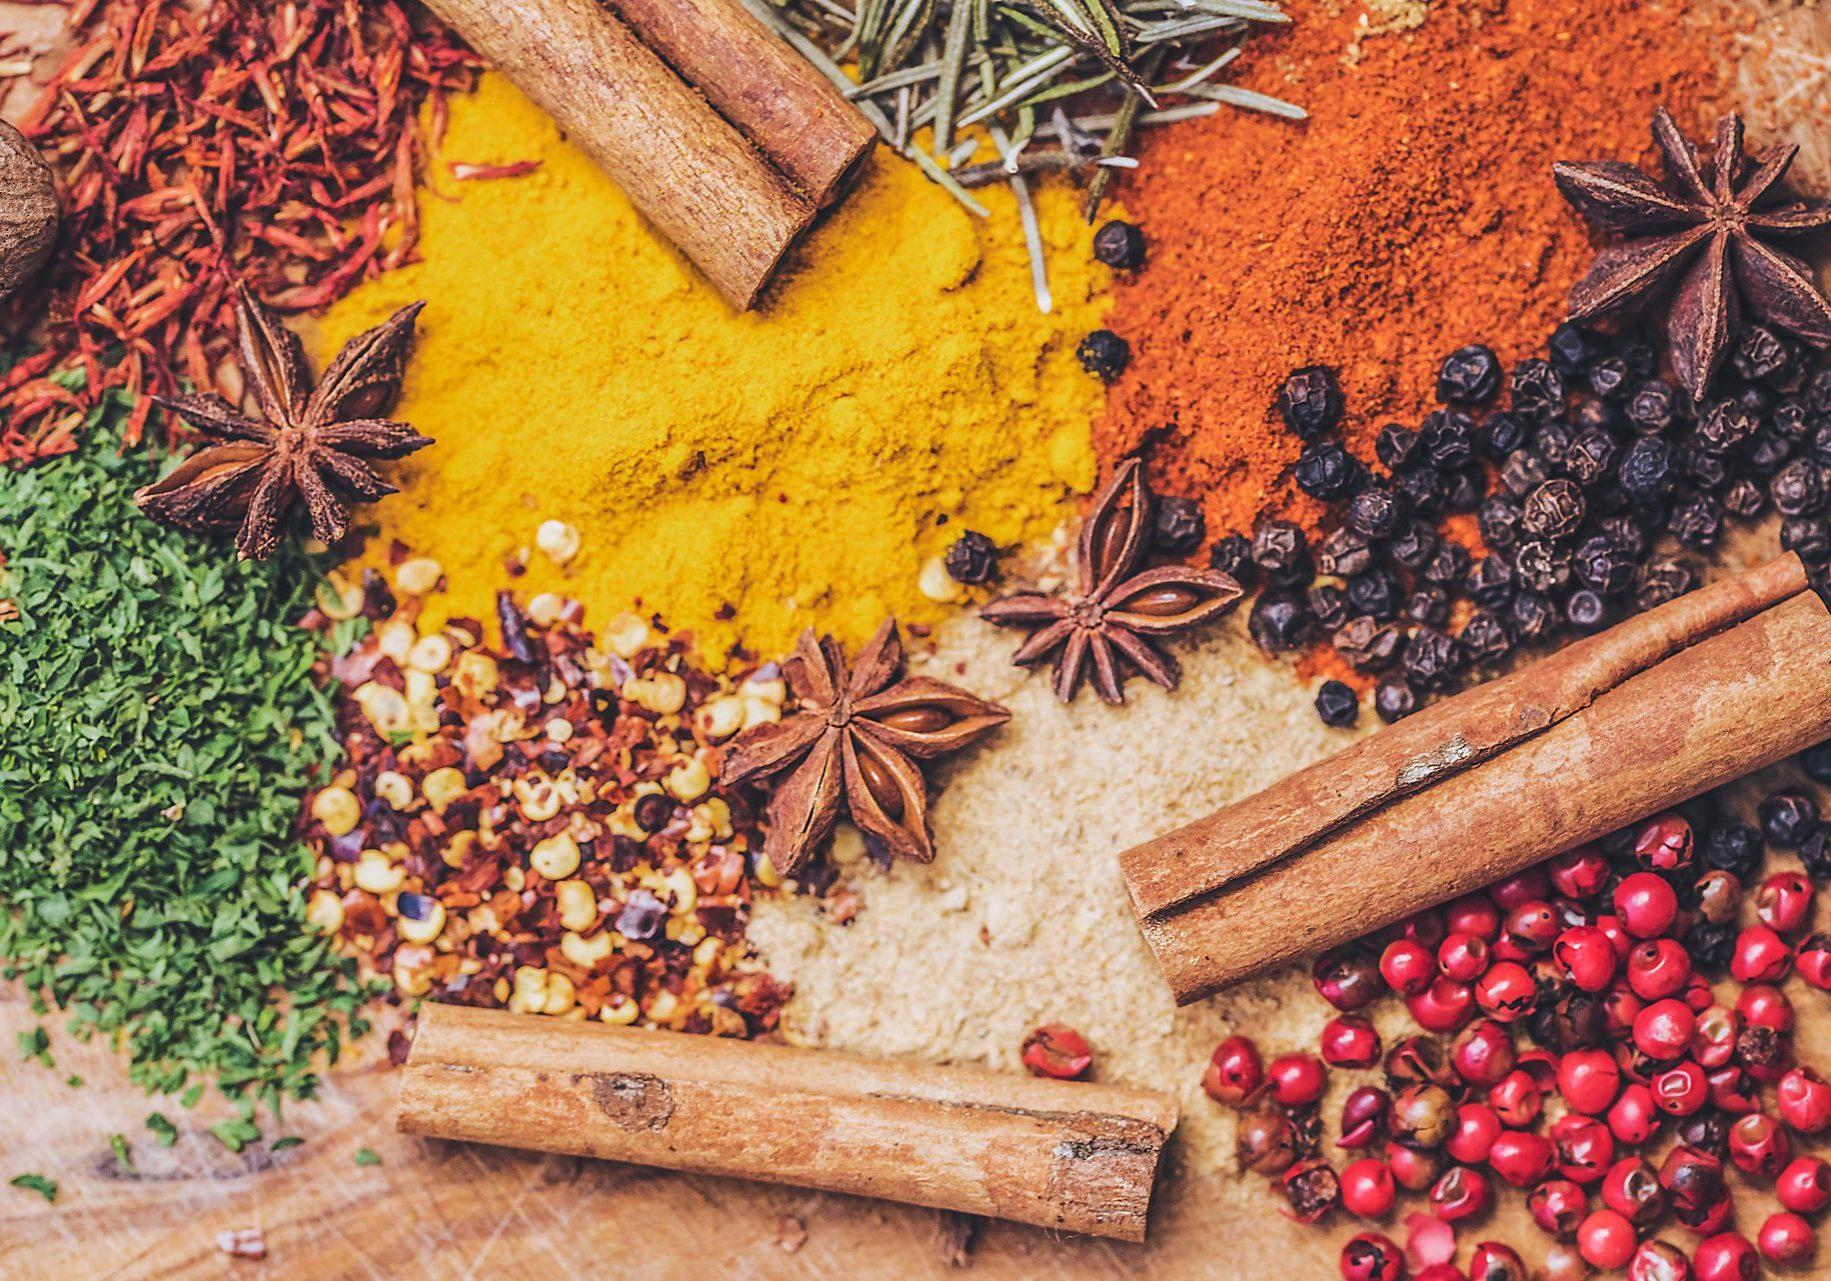 Scelta Inside colourful spices